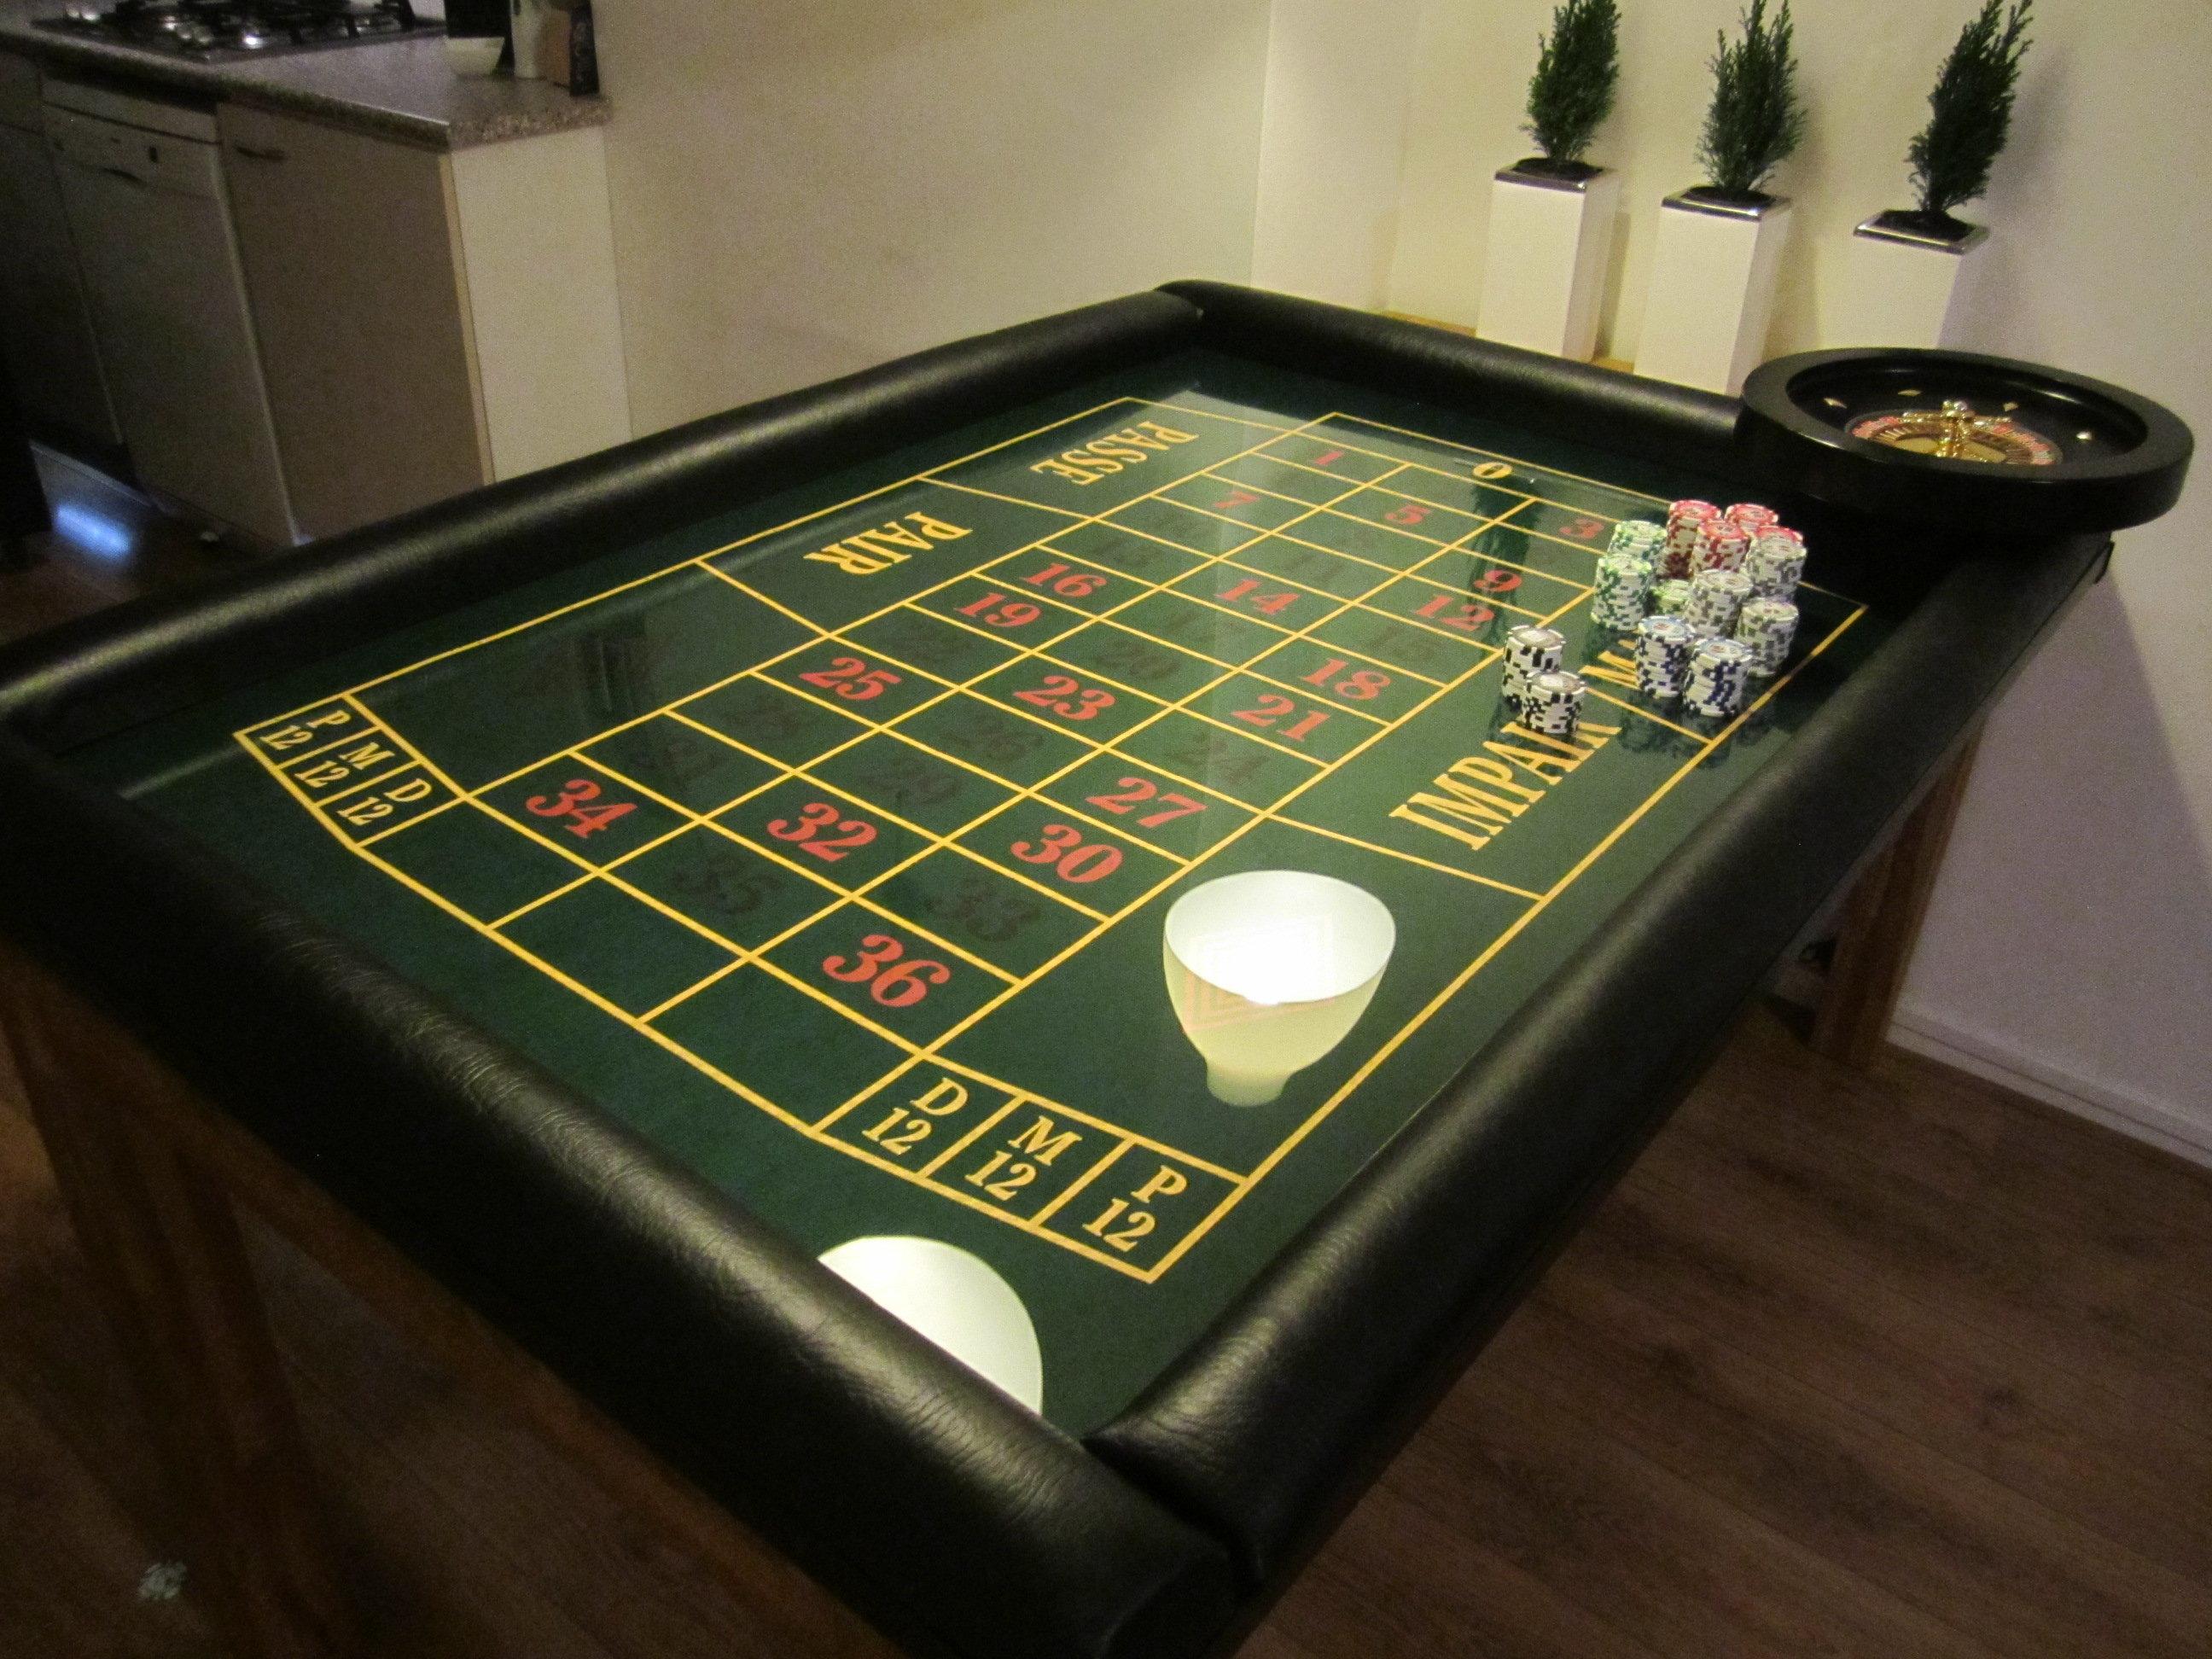 Roulette Tafel Huren : Roulette tafel huren slechts u ac euro per week